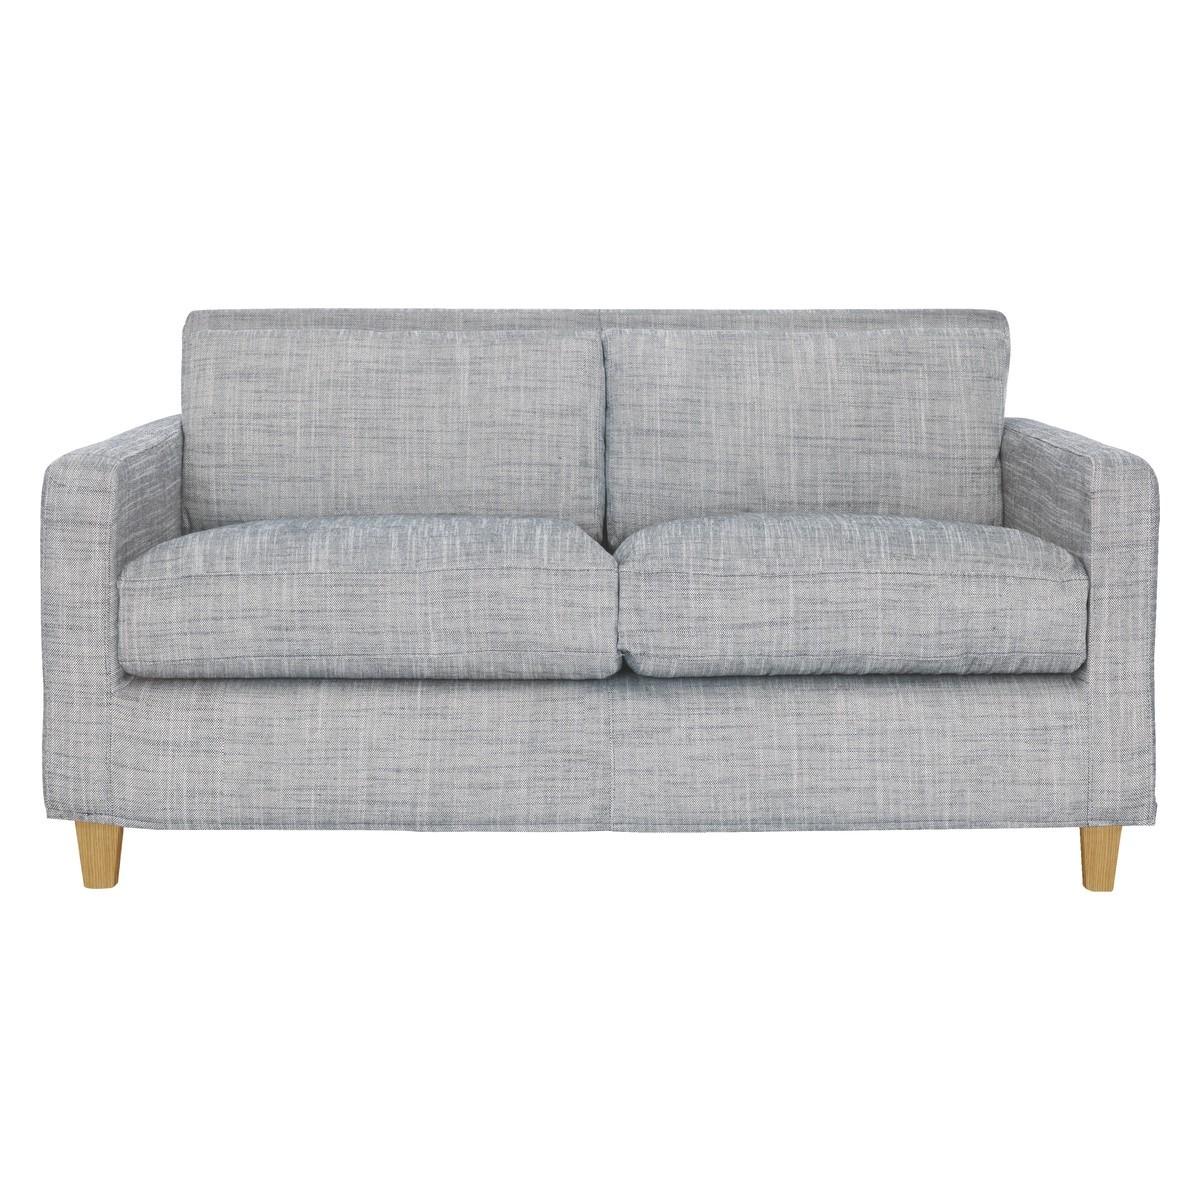 habitat chester sofa leather nailhead and loveseat 15 photos small 2 seater sofas ideas